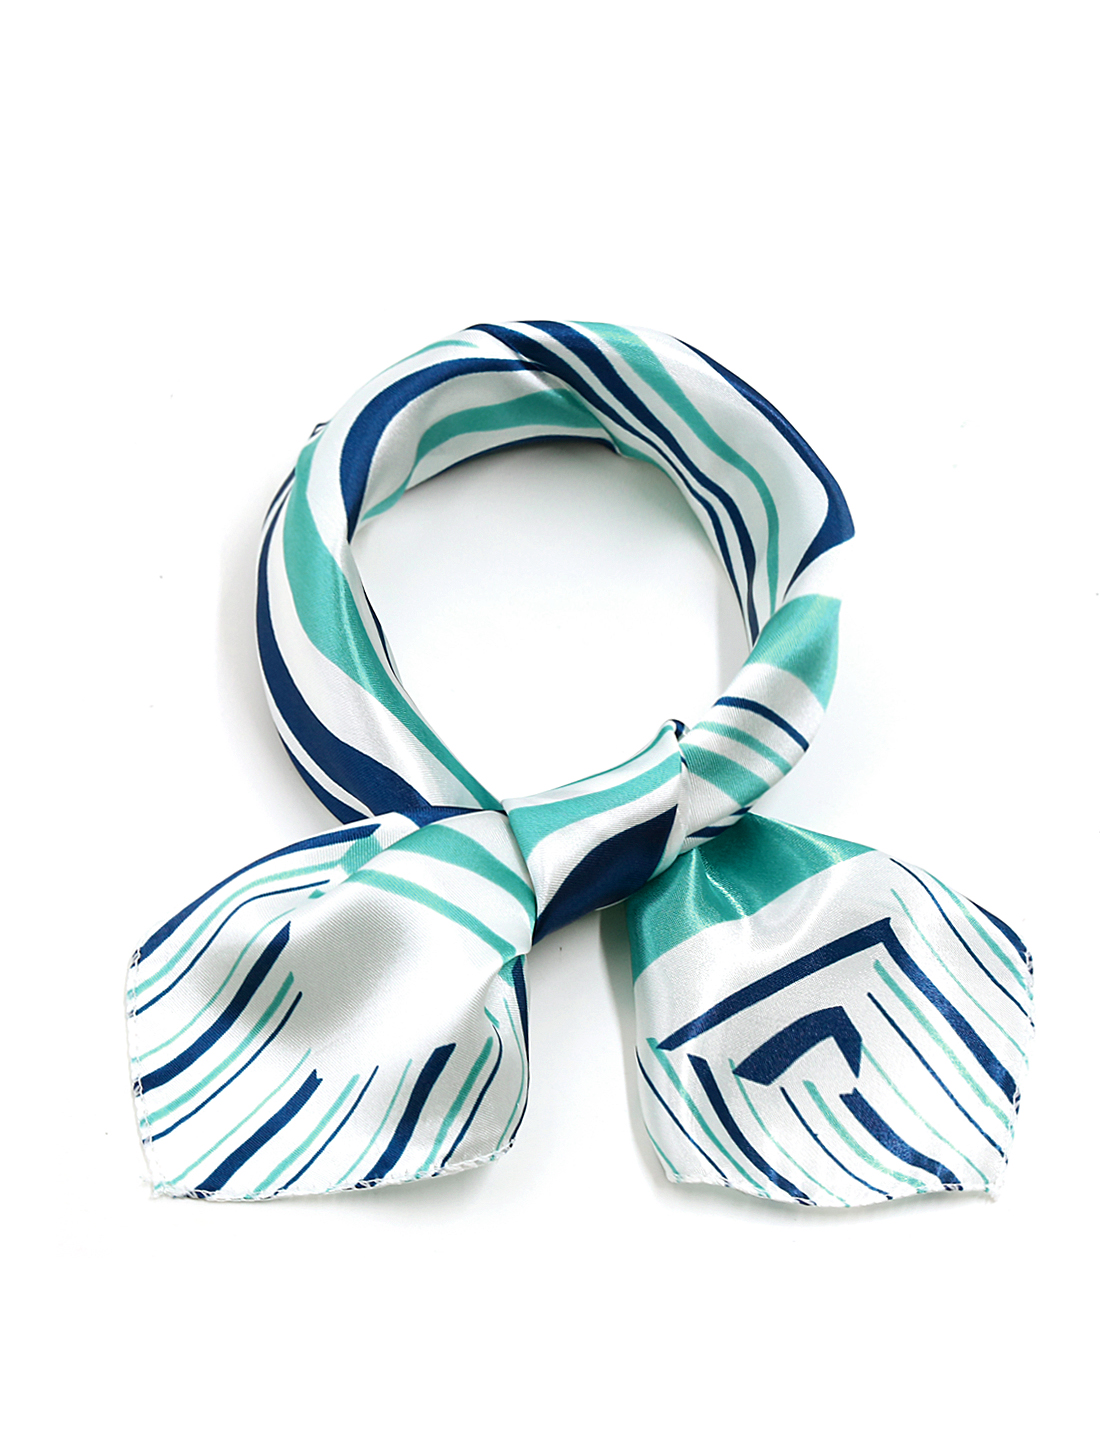 Ladies Squared Shape Novelty Pattern Leisure Kerchief Blue White